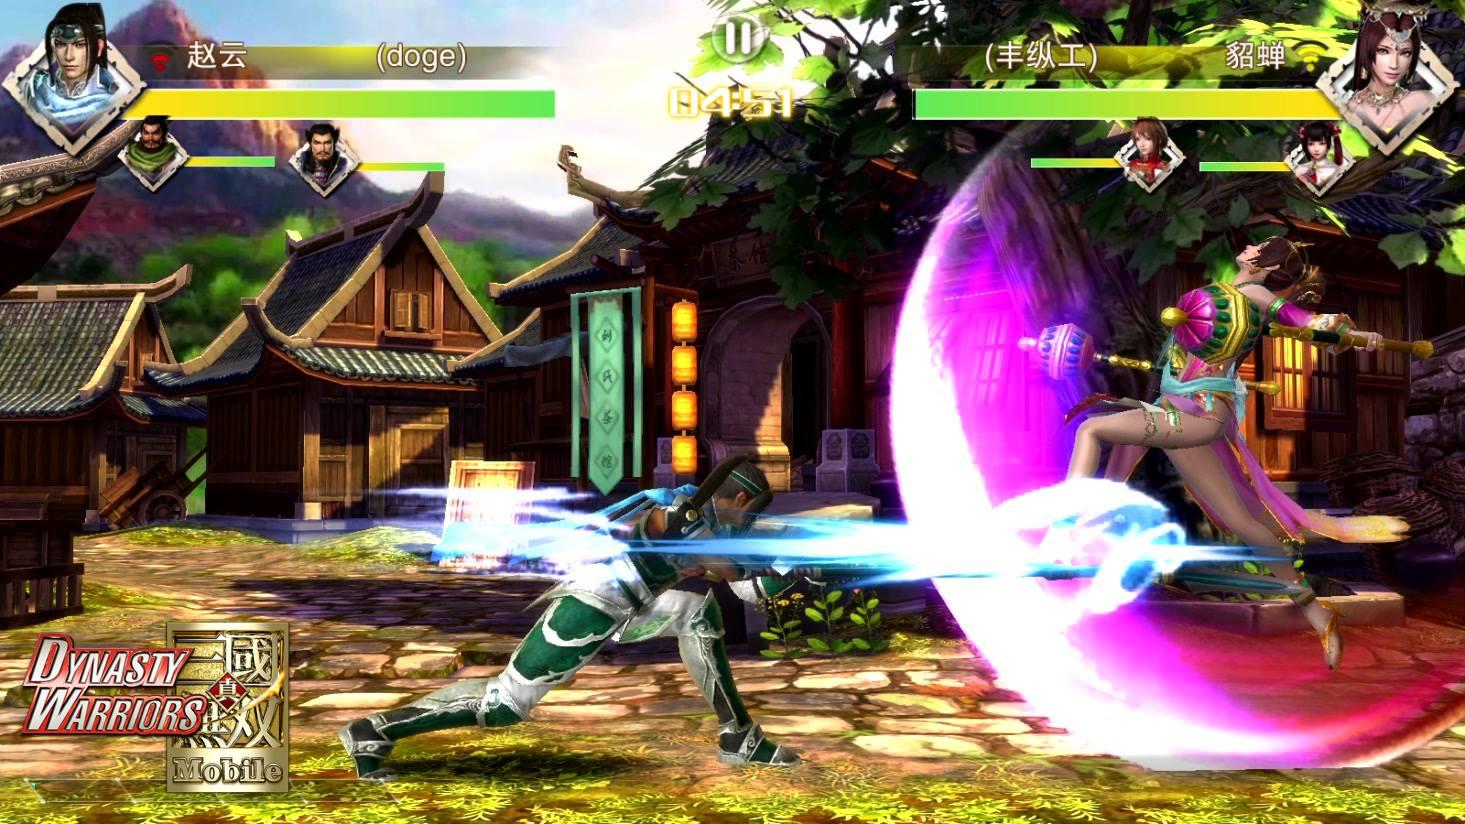 Dynasty Warriors Mobile screenshot 1